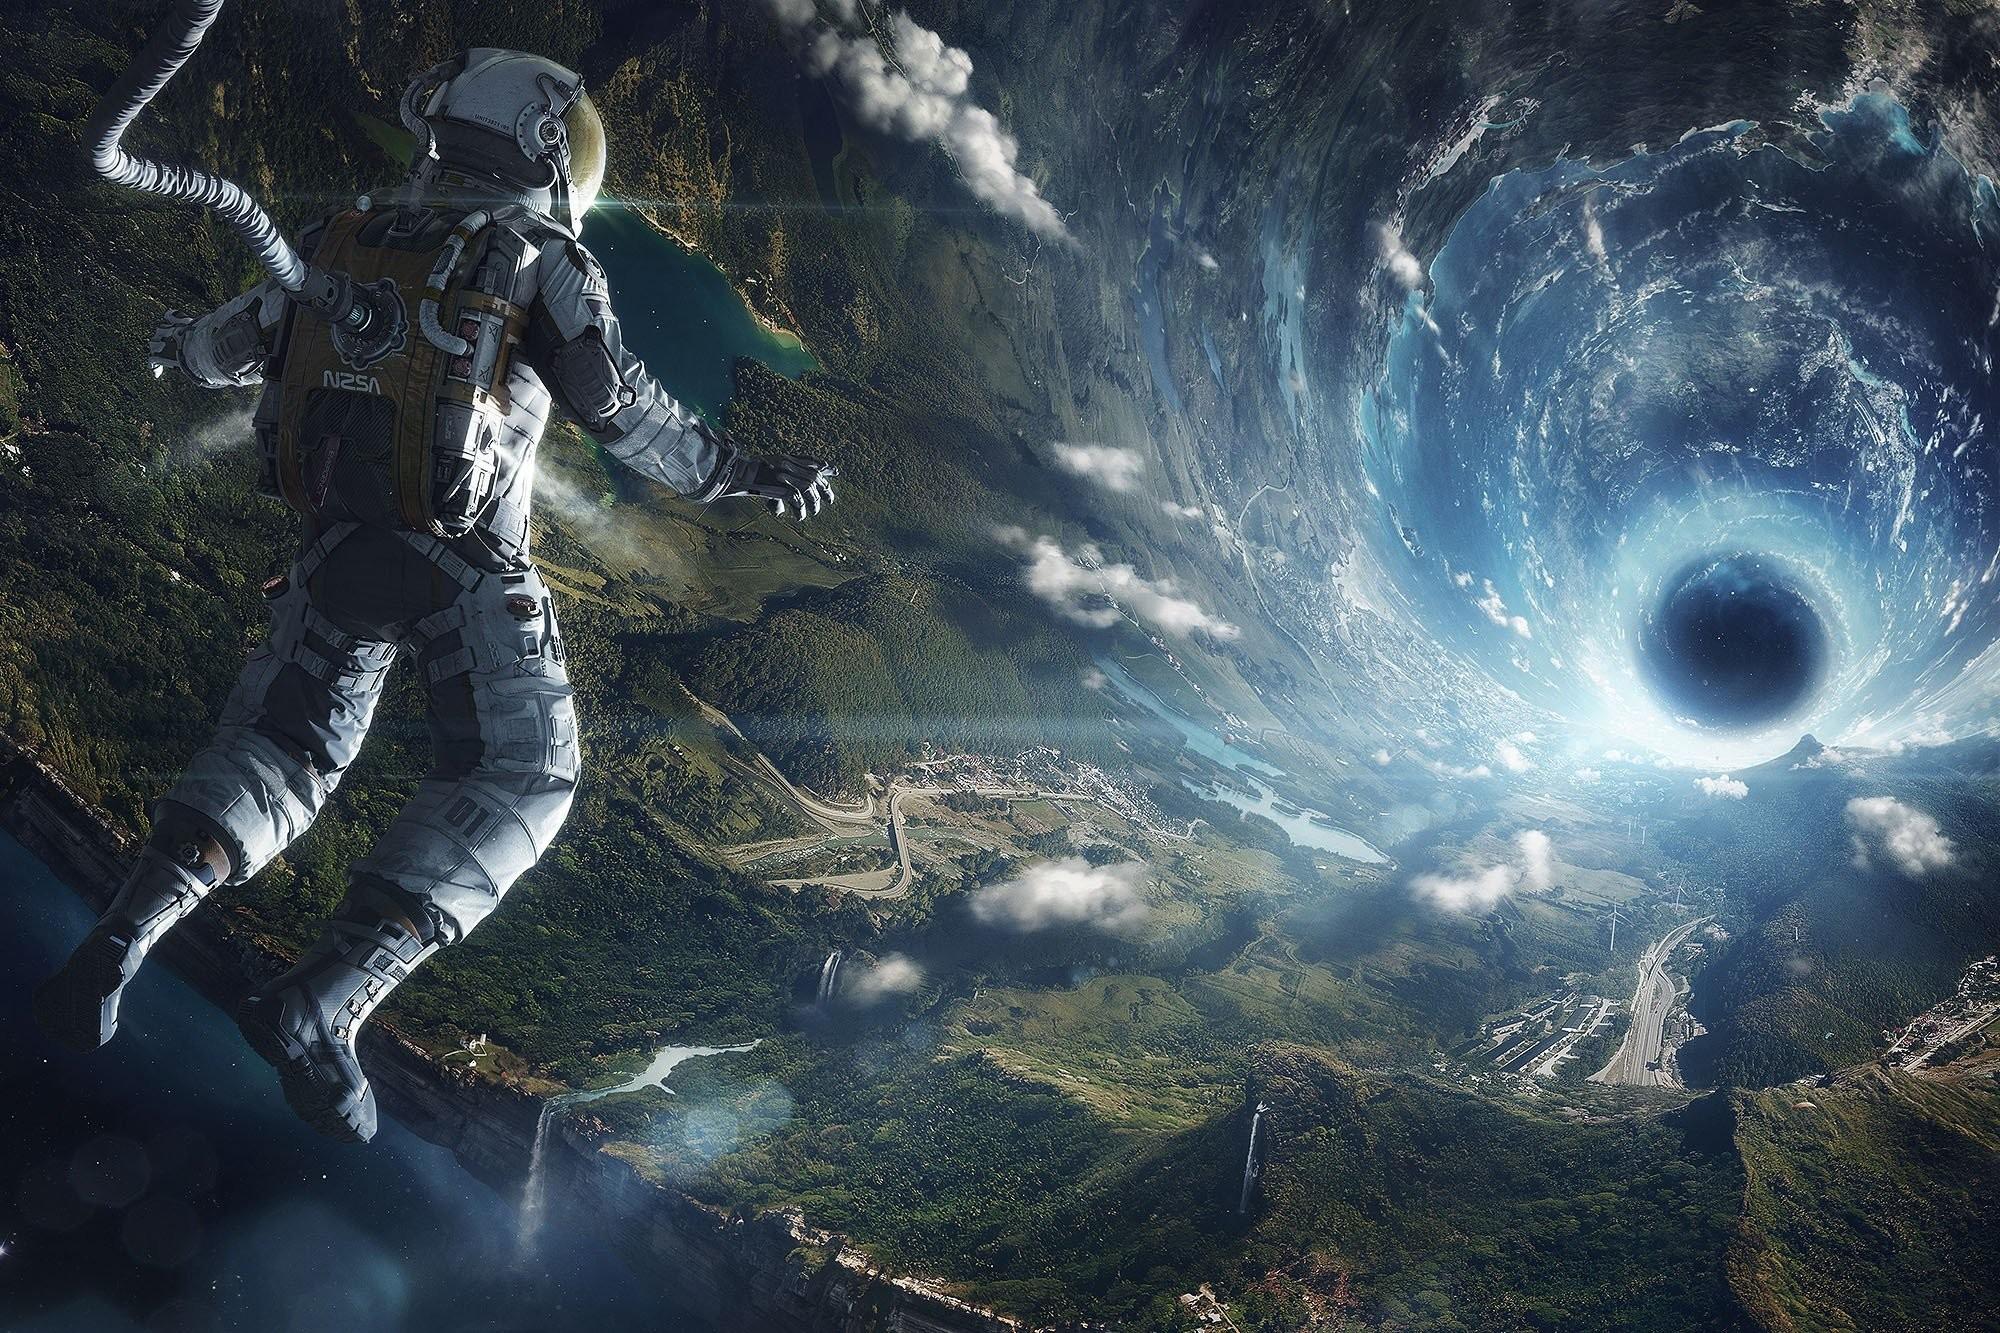 Fantasy Space Art Wallpaper 70 Images